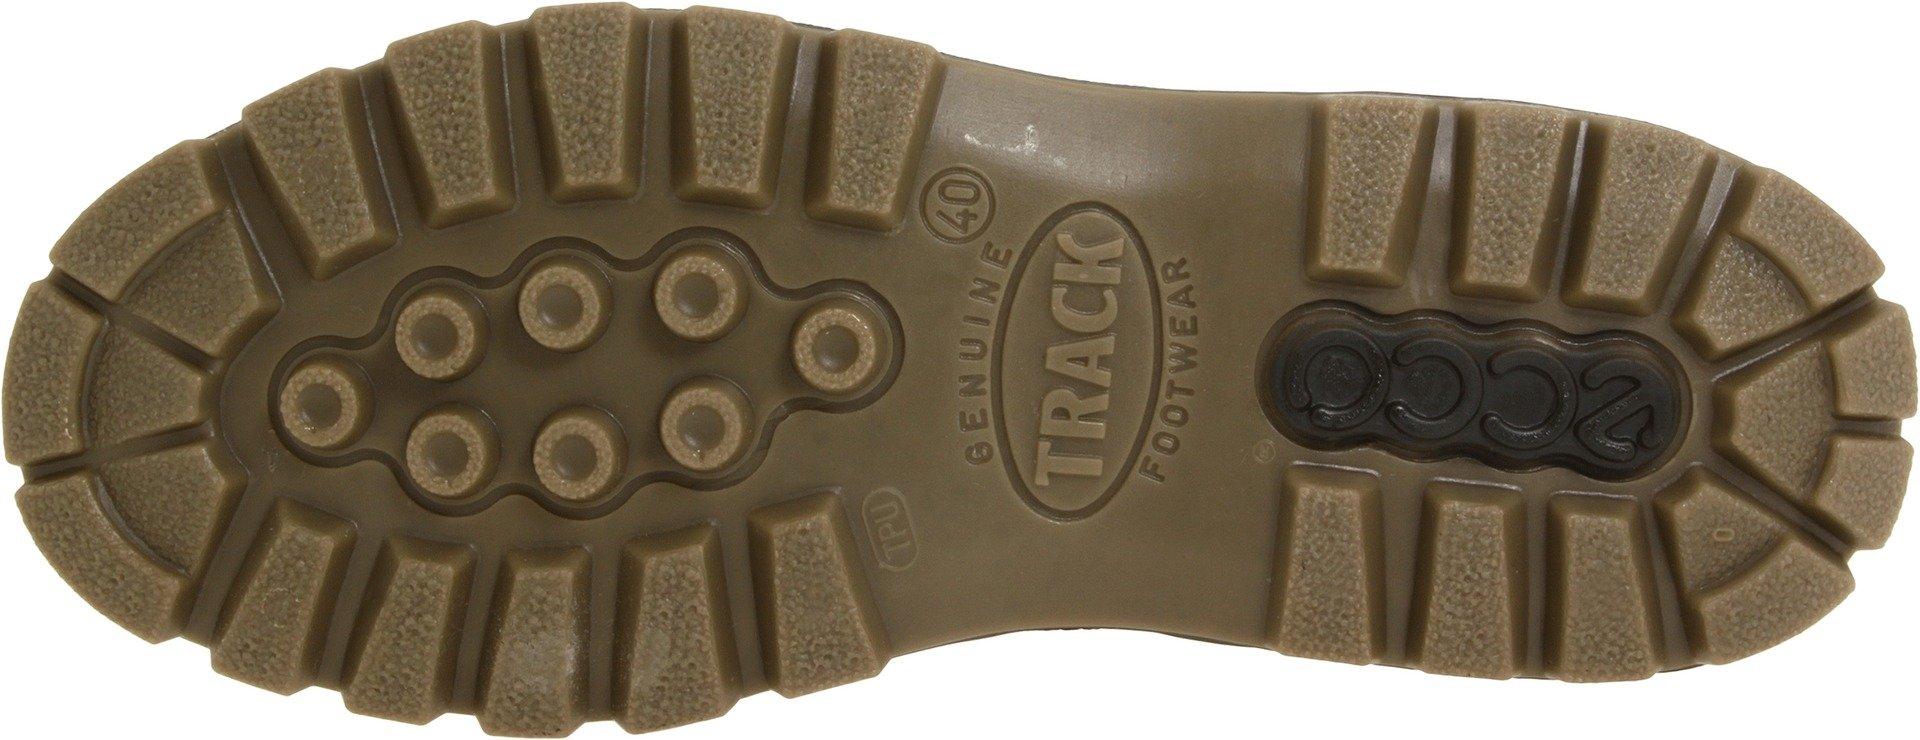 ECCO Men's Track II Mid Gore-Tex Boot,Bison,49 EU (US Men's 15-15.5 M) by ECCO (Image #4)